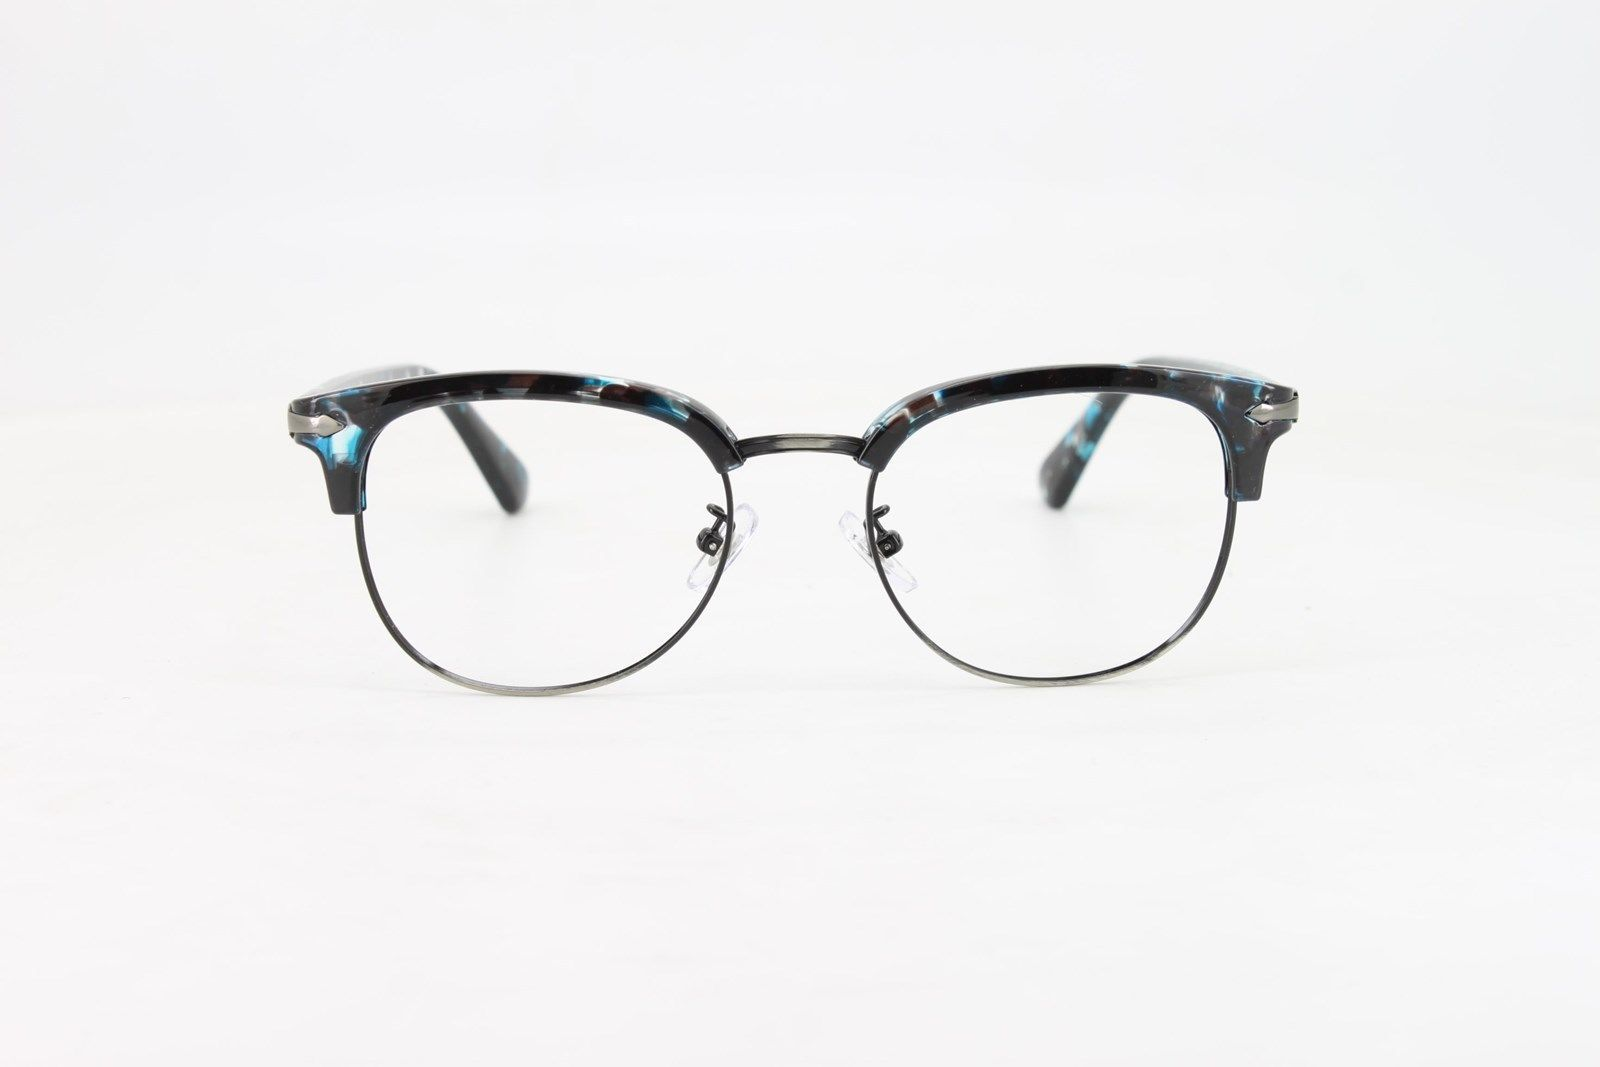 c0a356f49d8 Ebe Bifocal Reading Glasses Mens Womens Blue Tortoise Quarter Frame Retro  Trendy